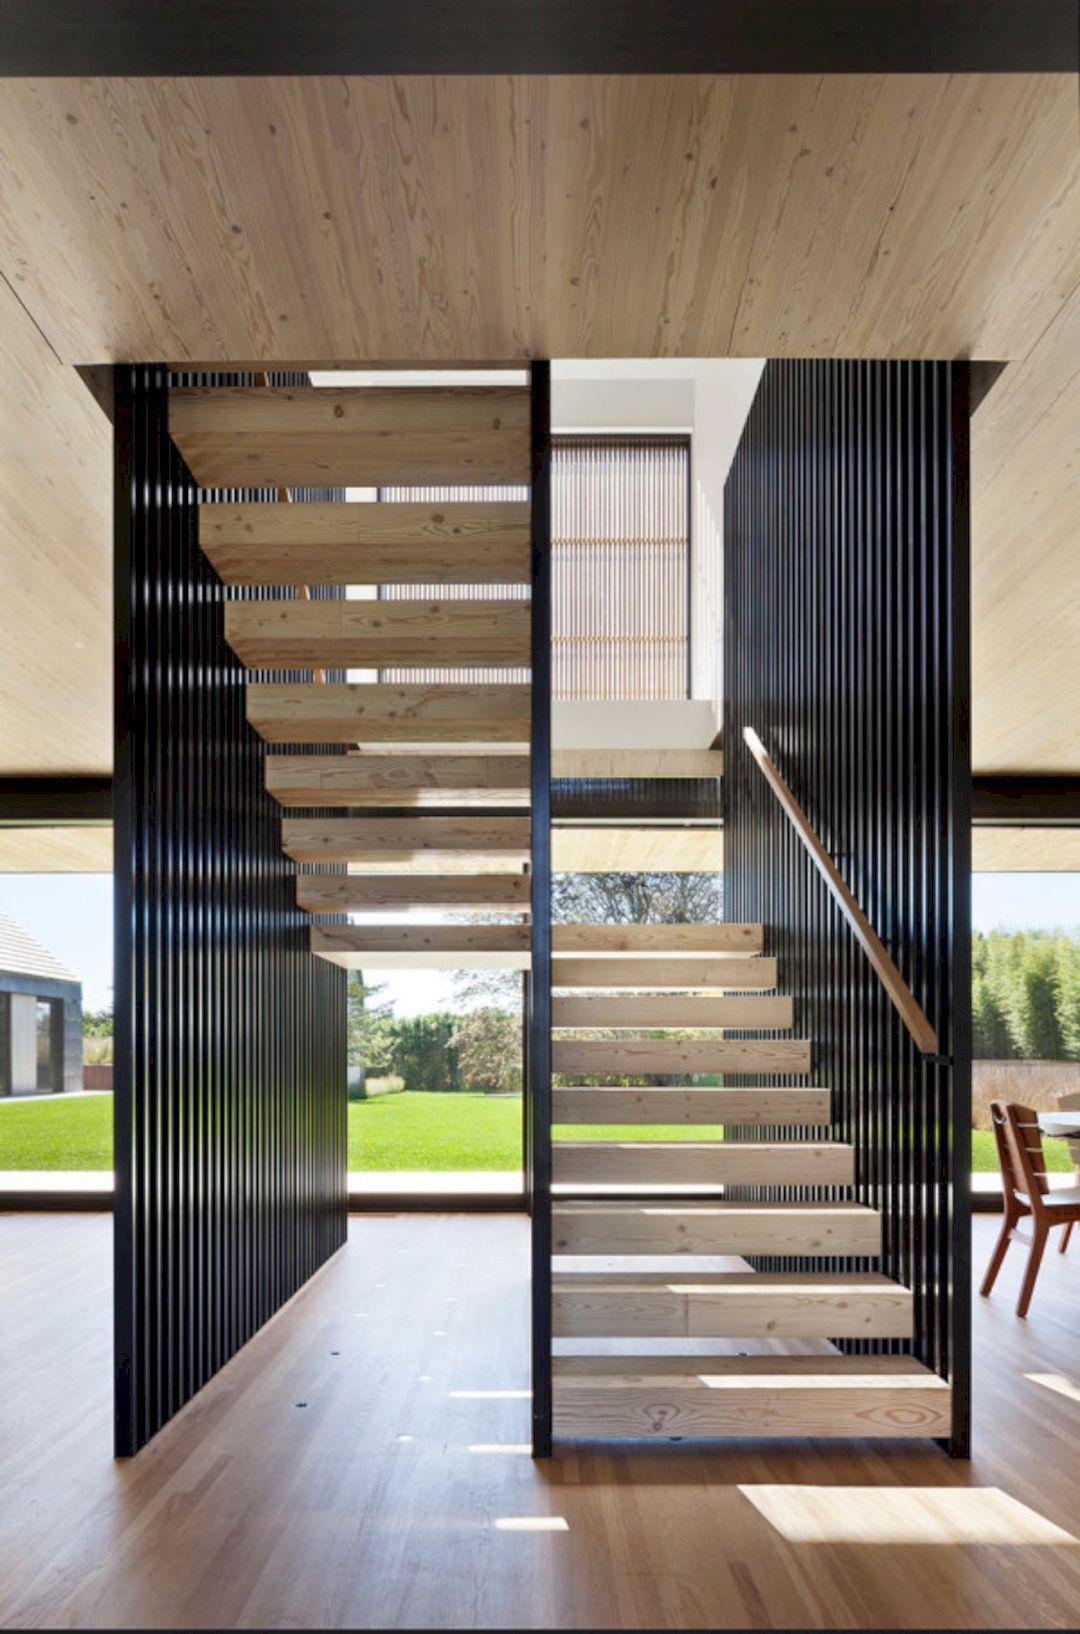 63 Impressive Staircase Design Ideas Https Www